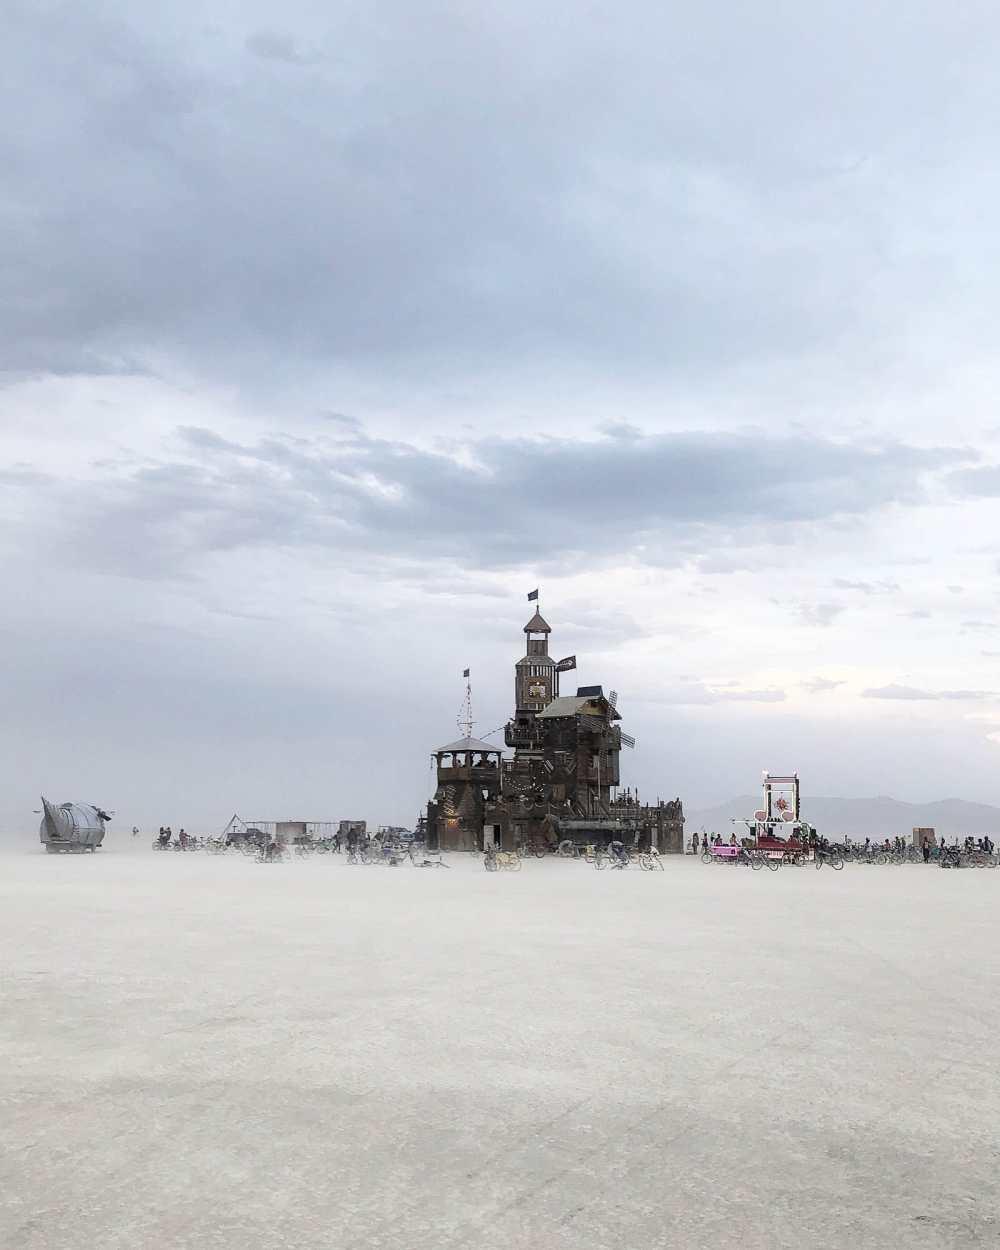 Руководство для новичков по Burning Man (20)